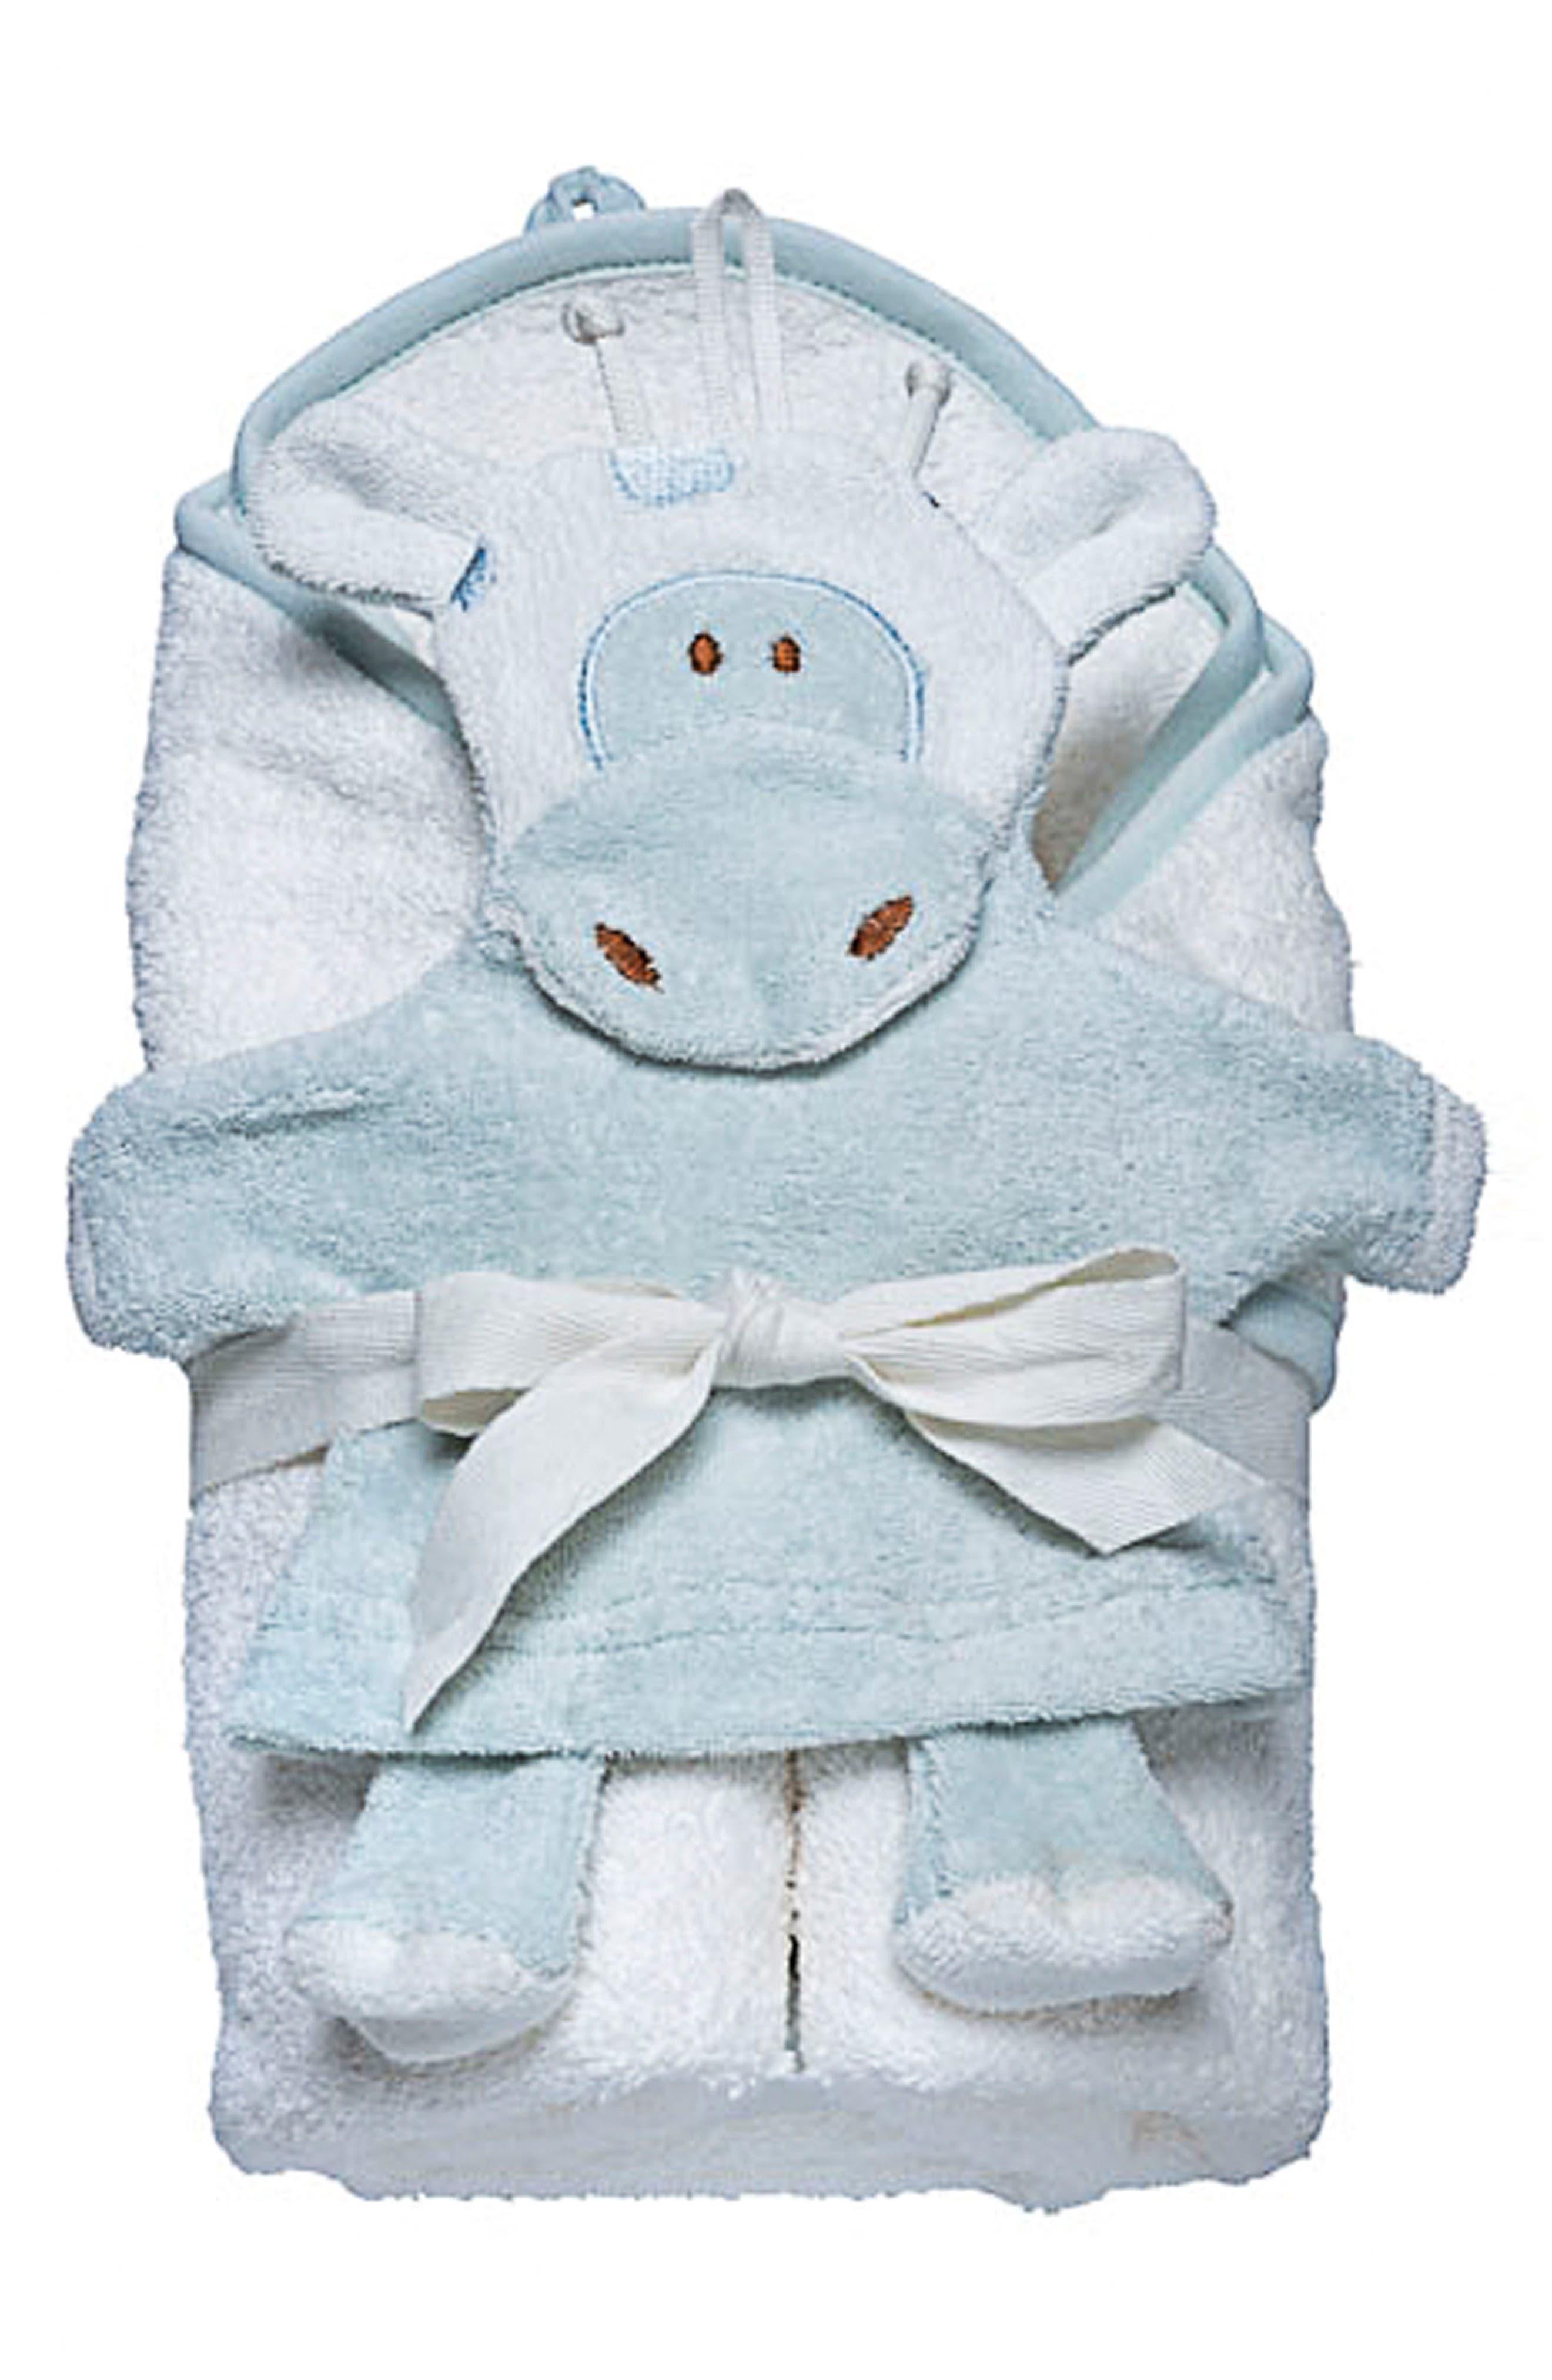 Hooded Towel & Bath Mitt Set,                             Main thumbnail 1, color,                             WHITE